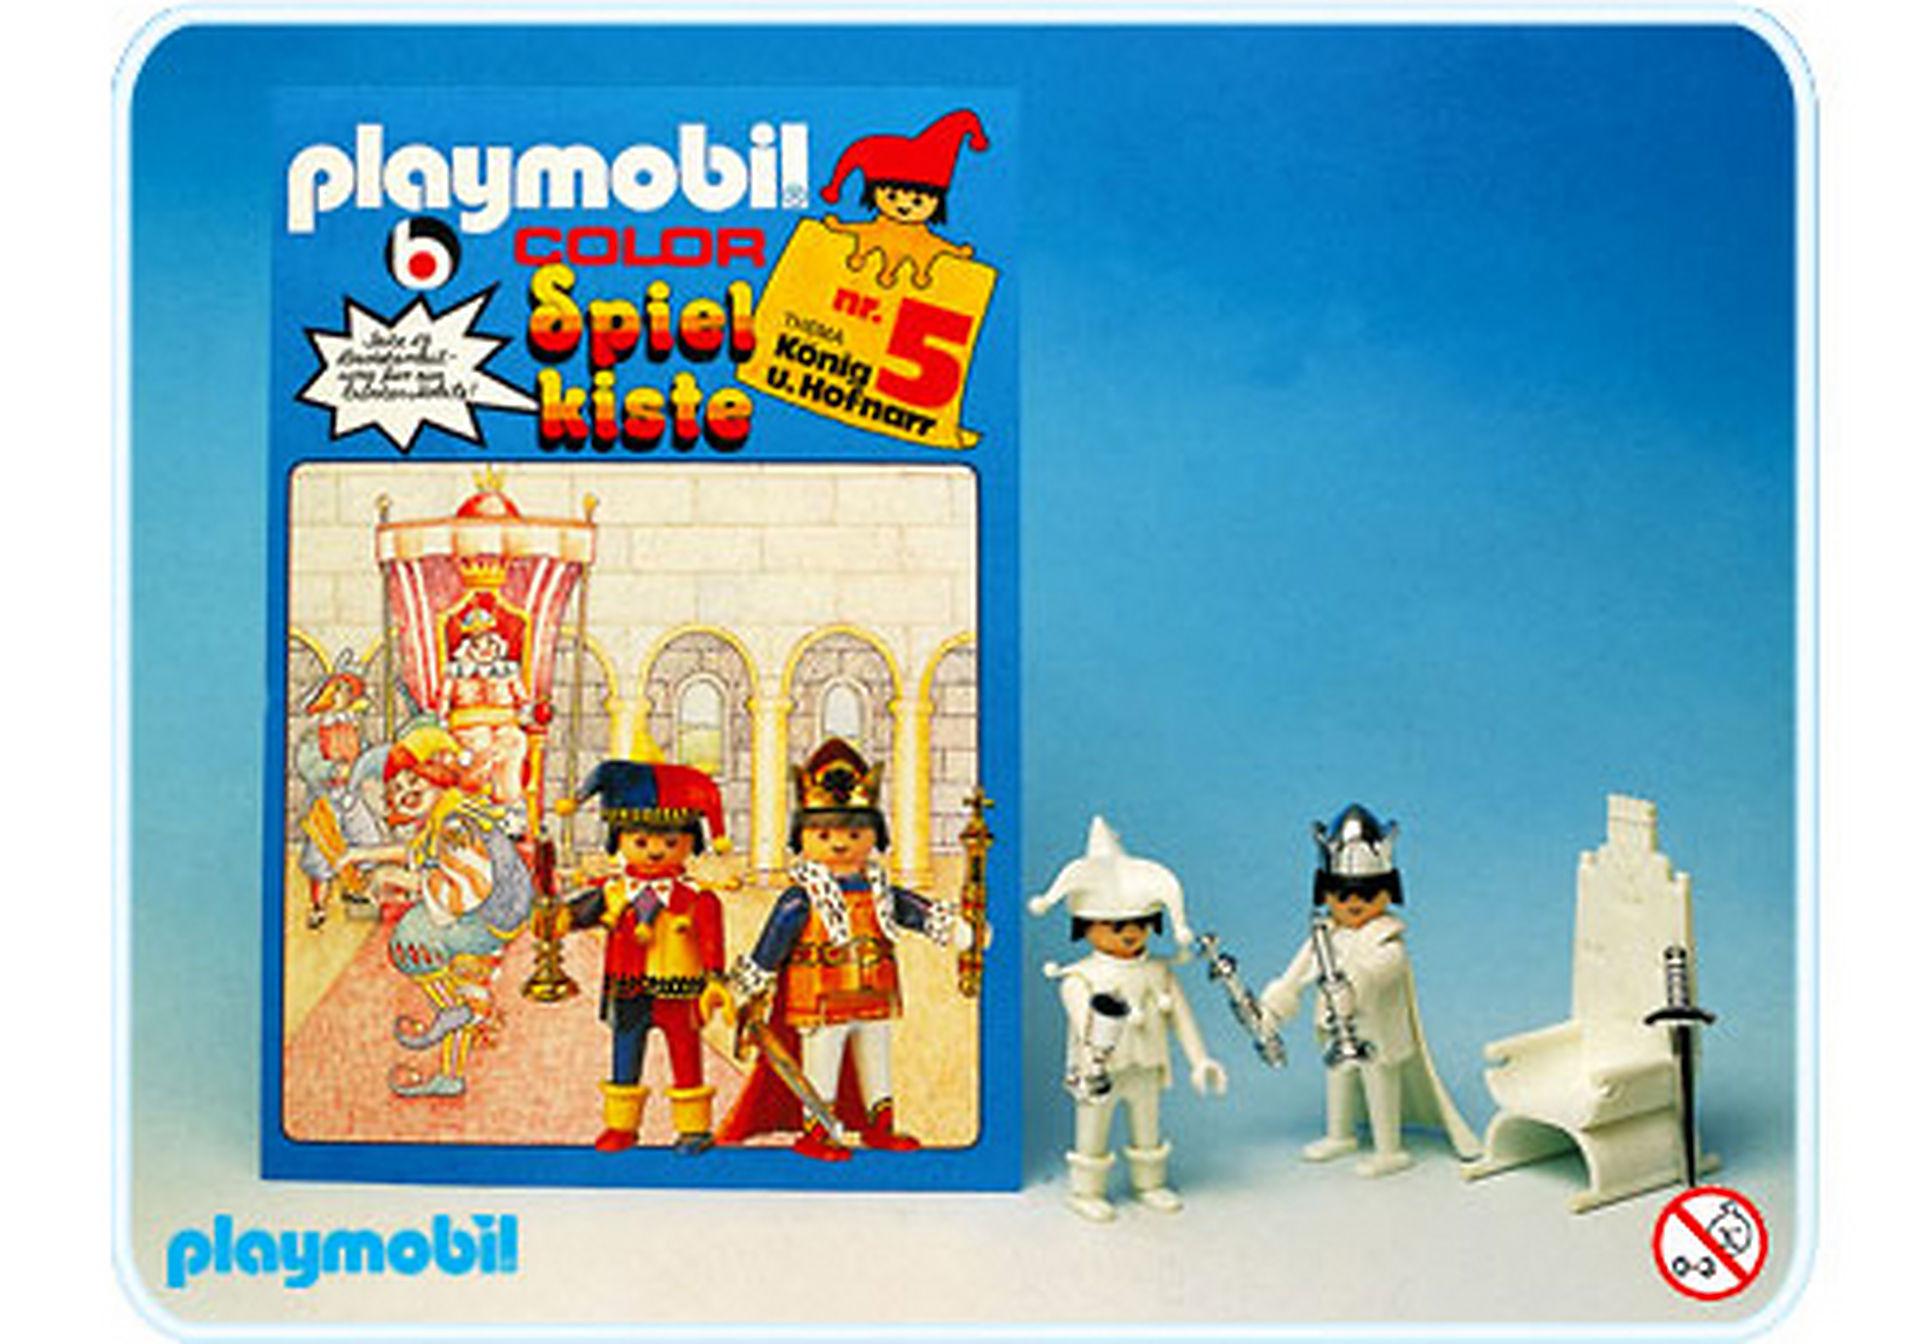 http://media.playmobil.com/i/playmobil/3664-A_product_detail/Spielkiste Nr. 5 - König und Hofnarr